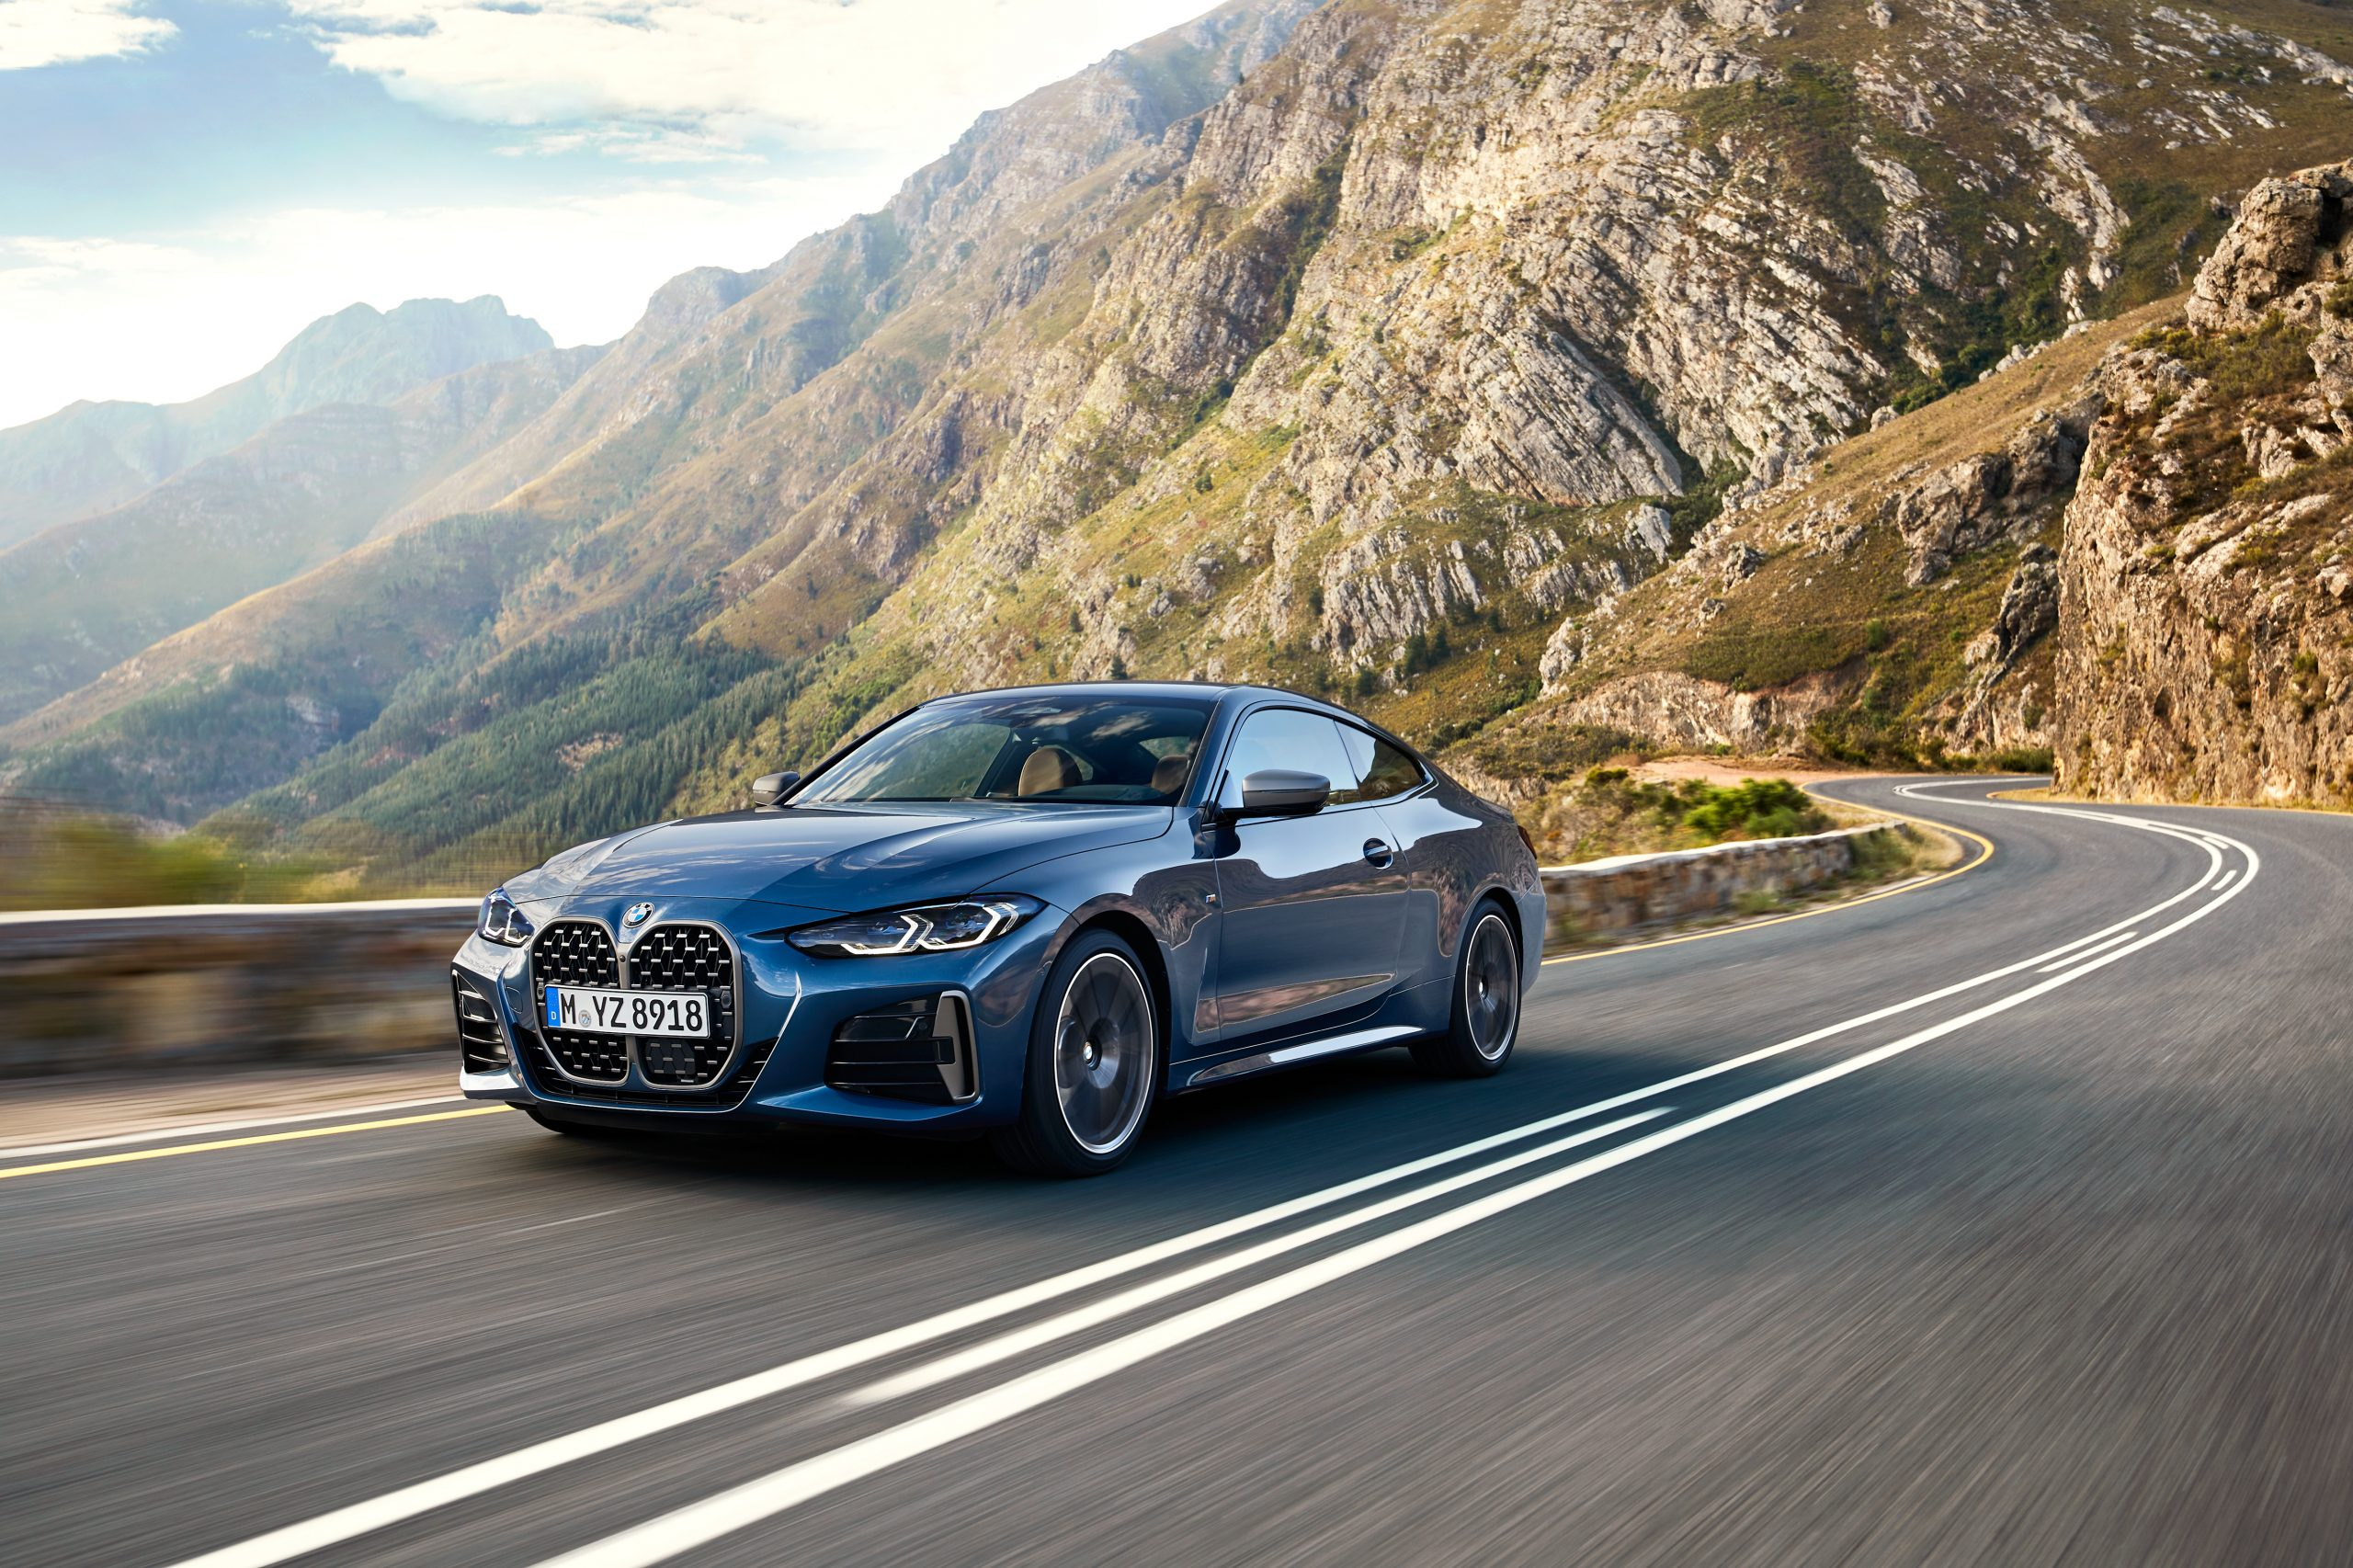 De nieuwe BMW 4 Serie Coupé